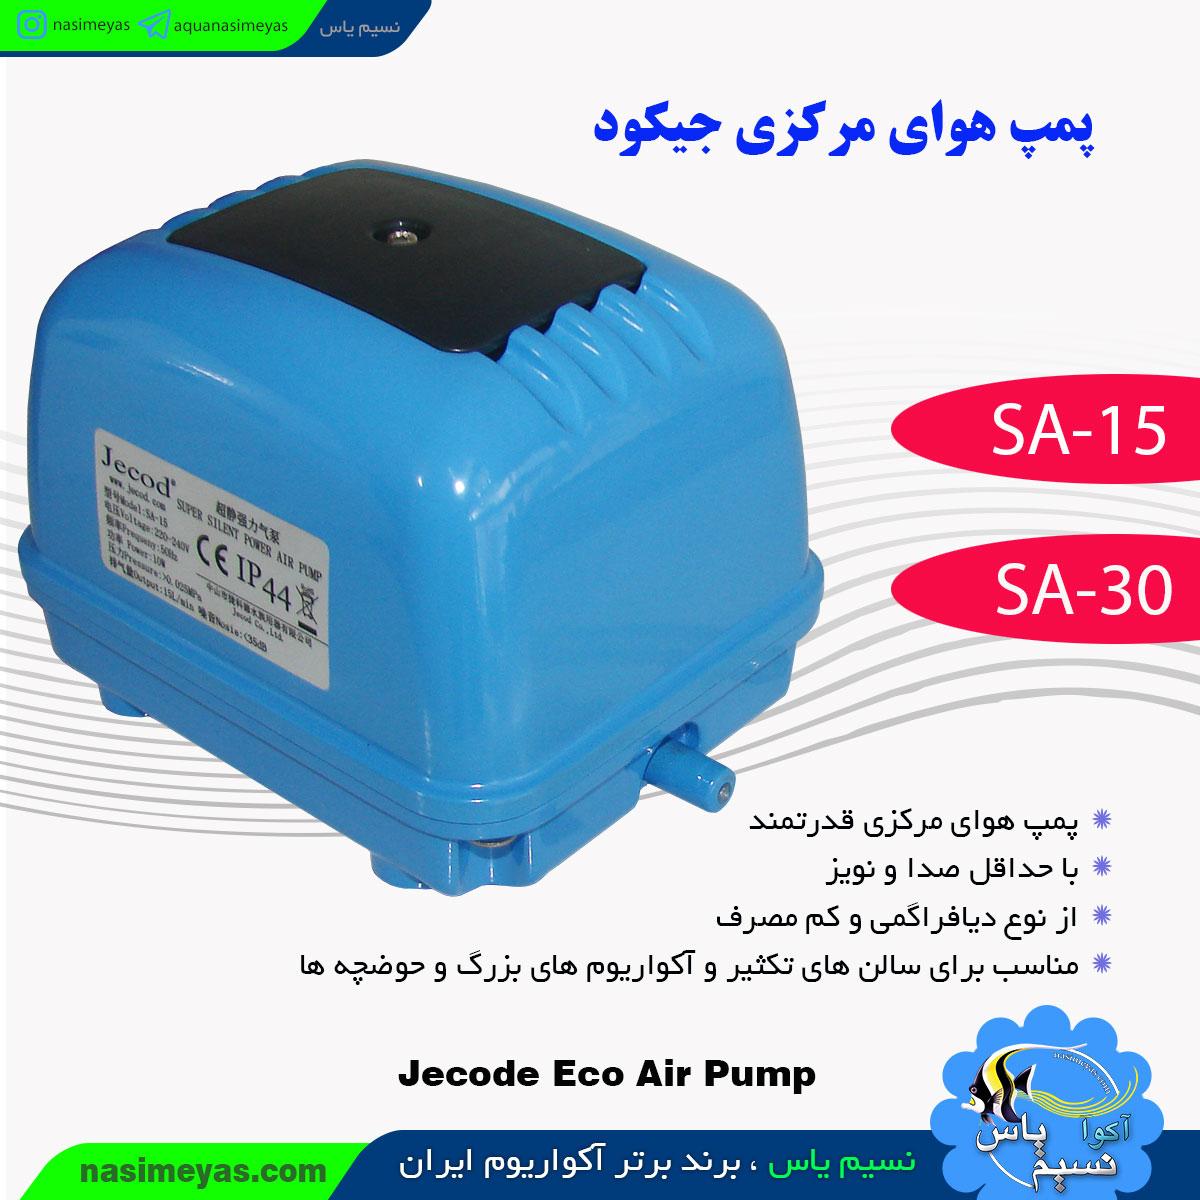 Jecod ECO Air Pump